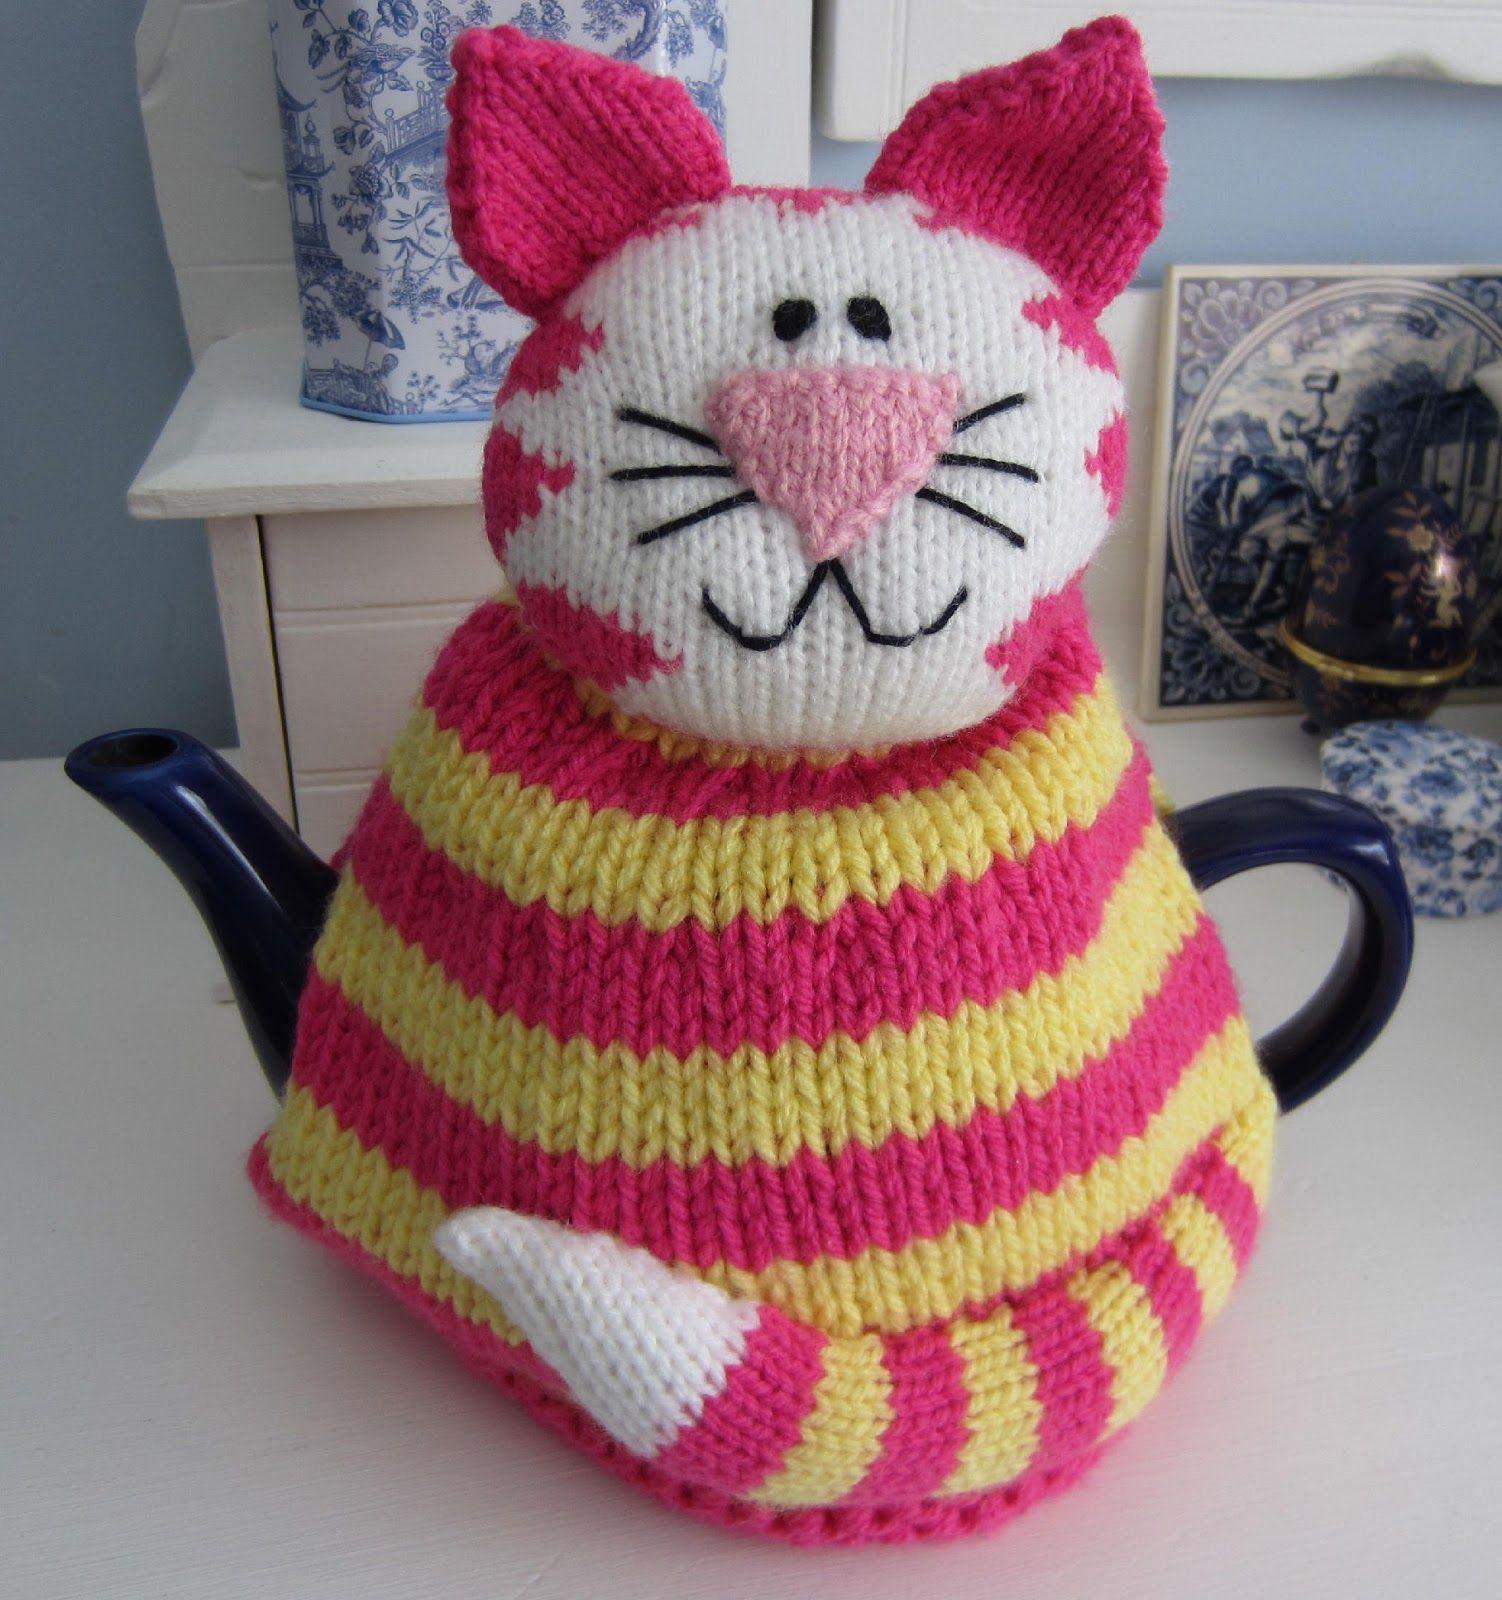 Coffee in a tea-cup | Tea cosy knitting pattern, Tea cosy ...